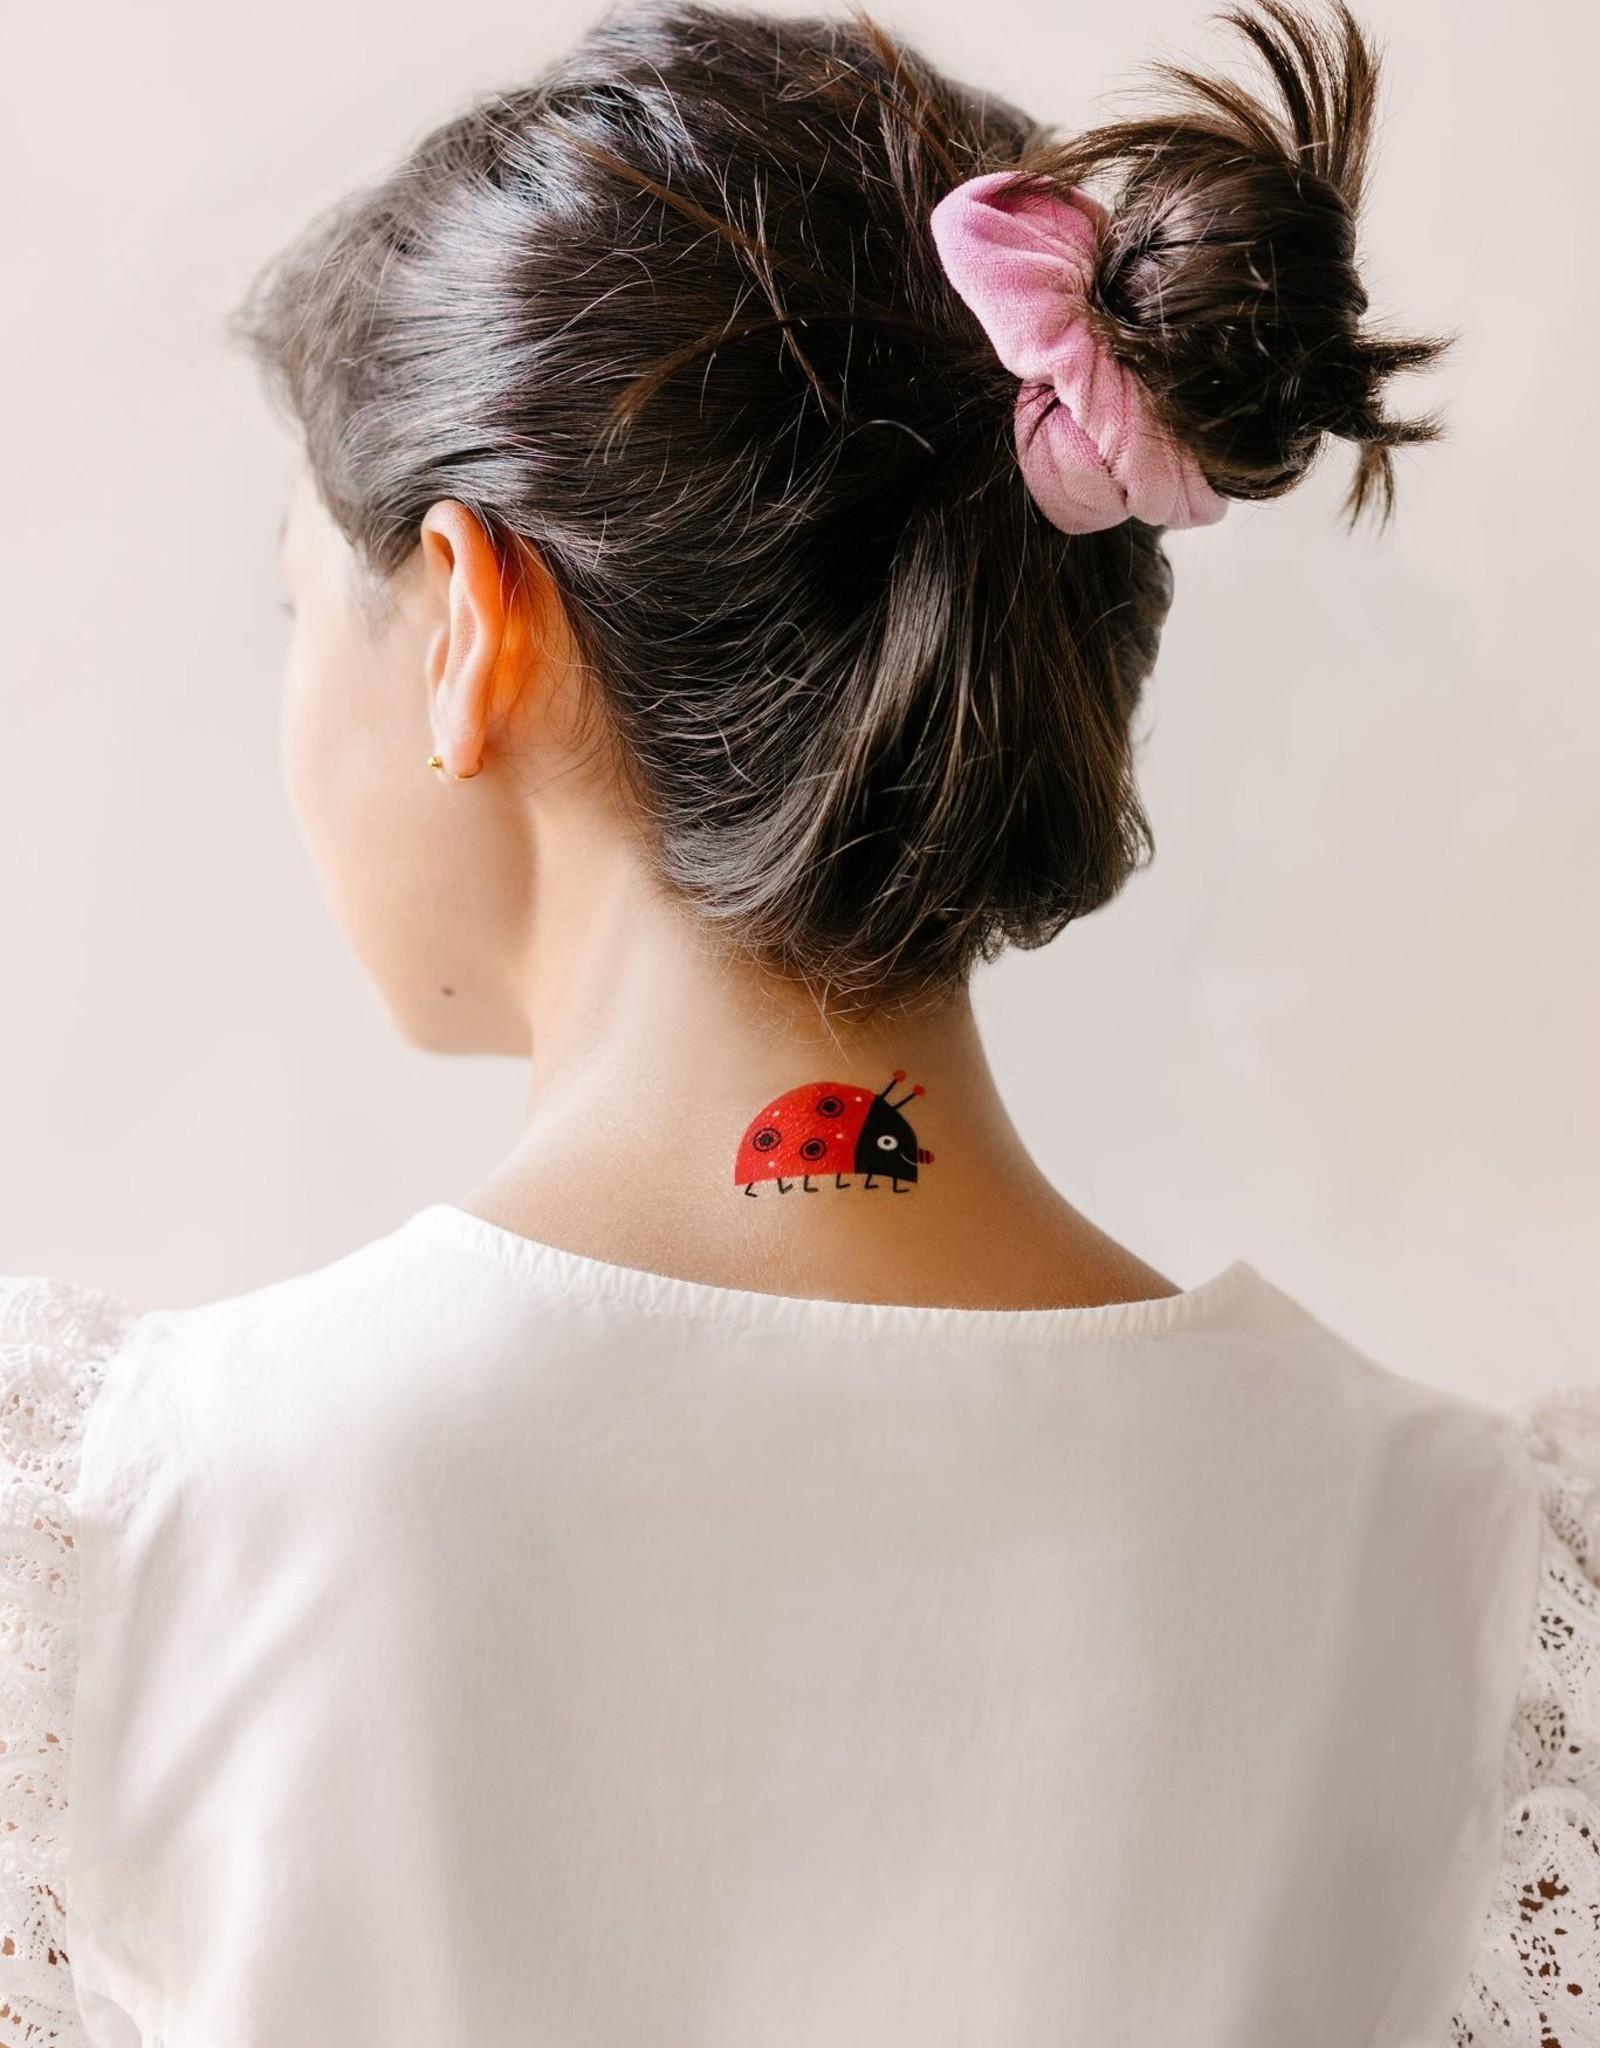 Tattly tattoo pair- mr. ladybug